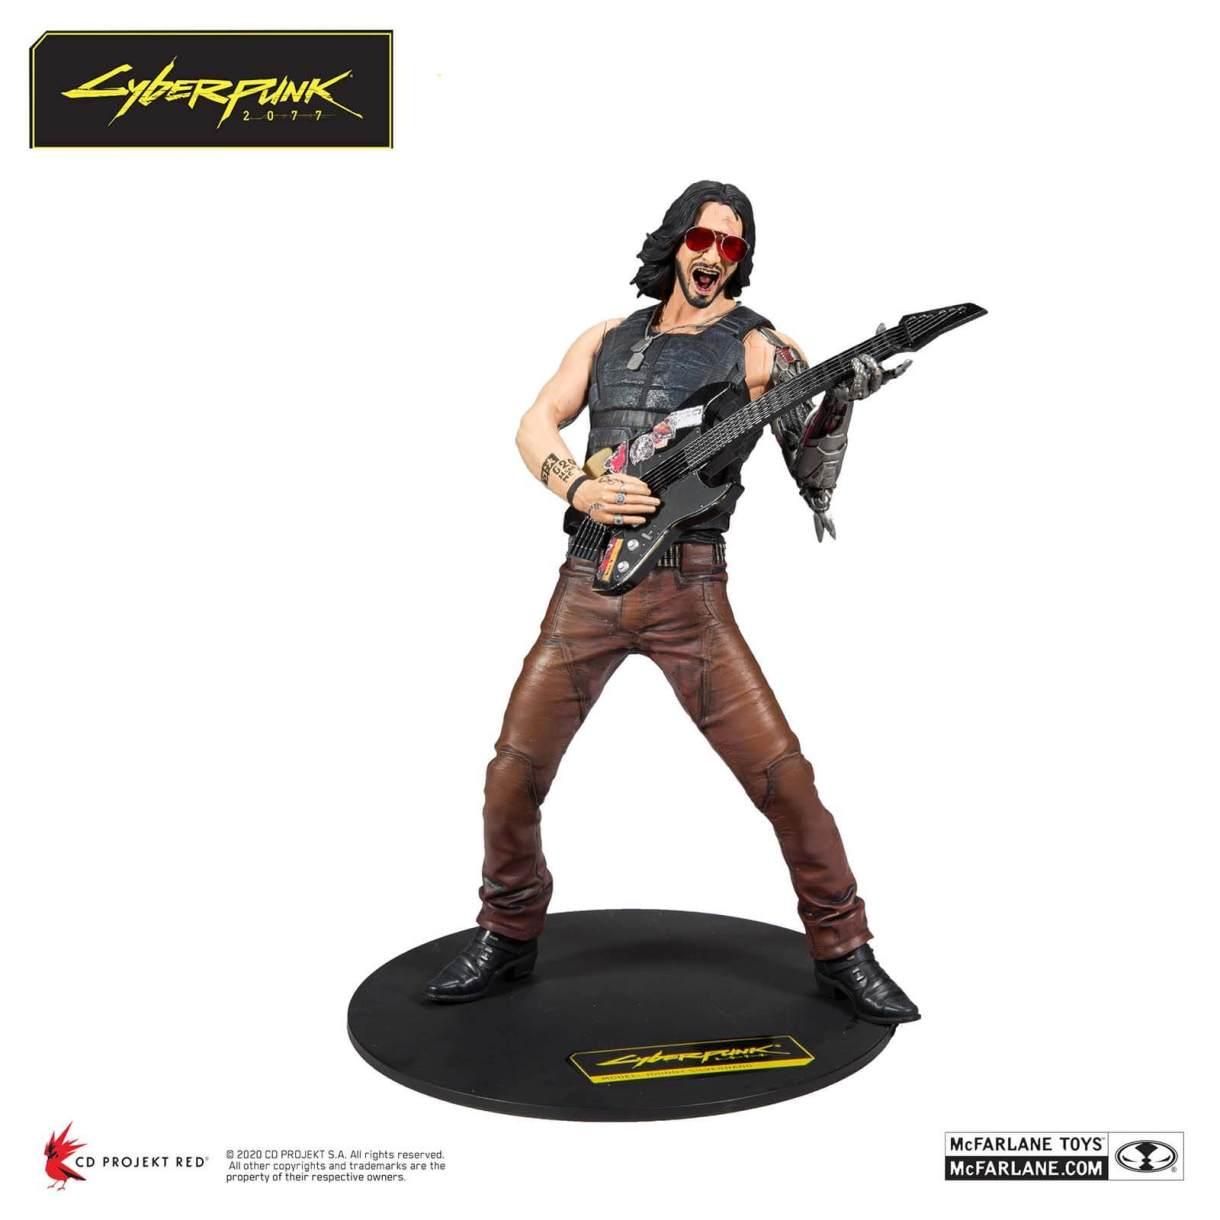 McFarlane Toys Cyberpunk 2077 Johnny 12-Inch Action Figure ...